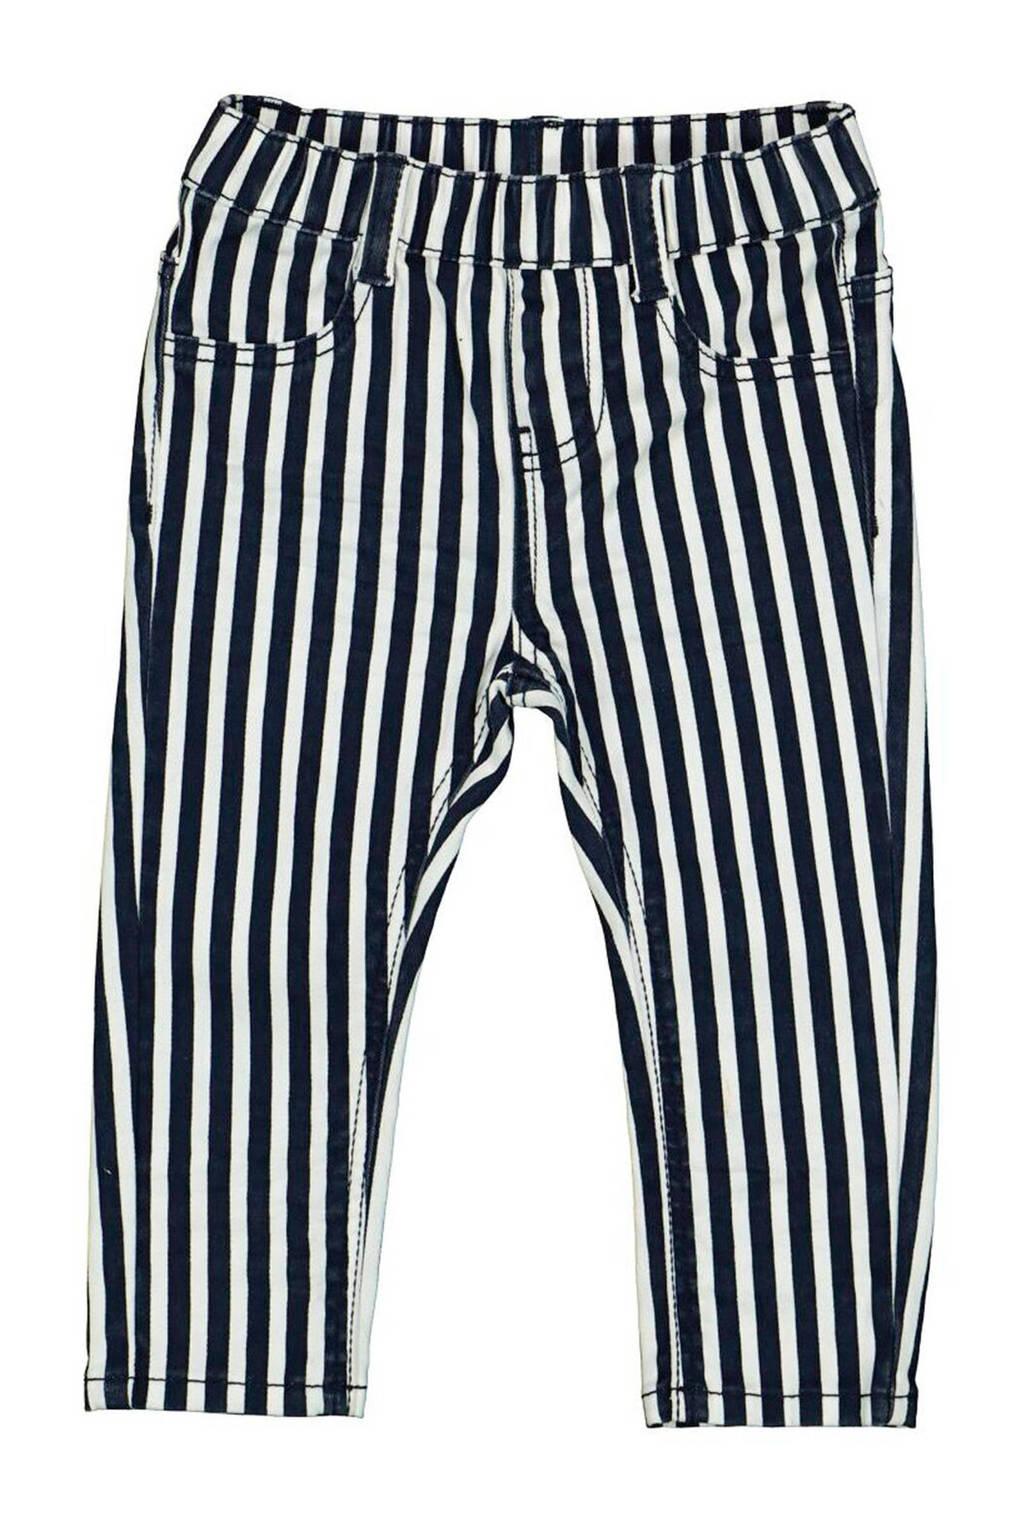 HEMA gestreepte skinny broek blauw, Blauw